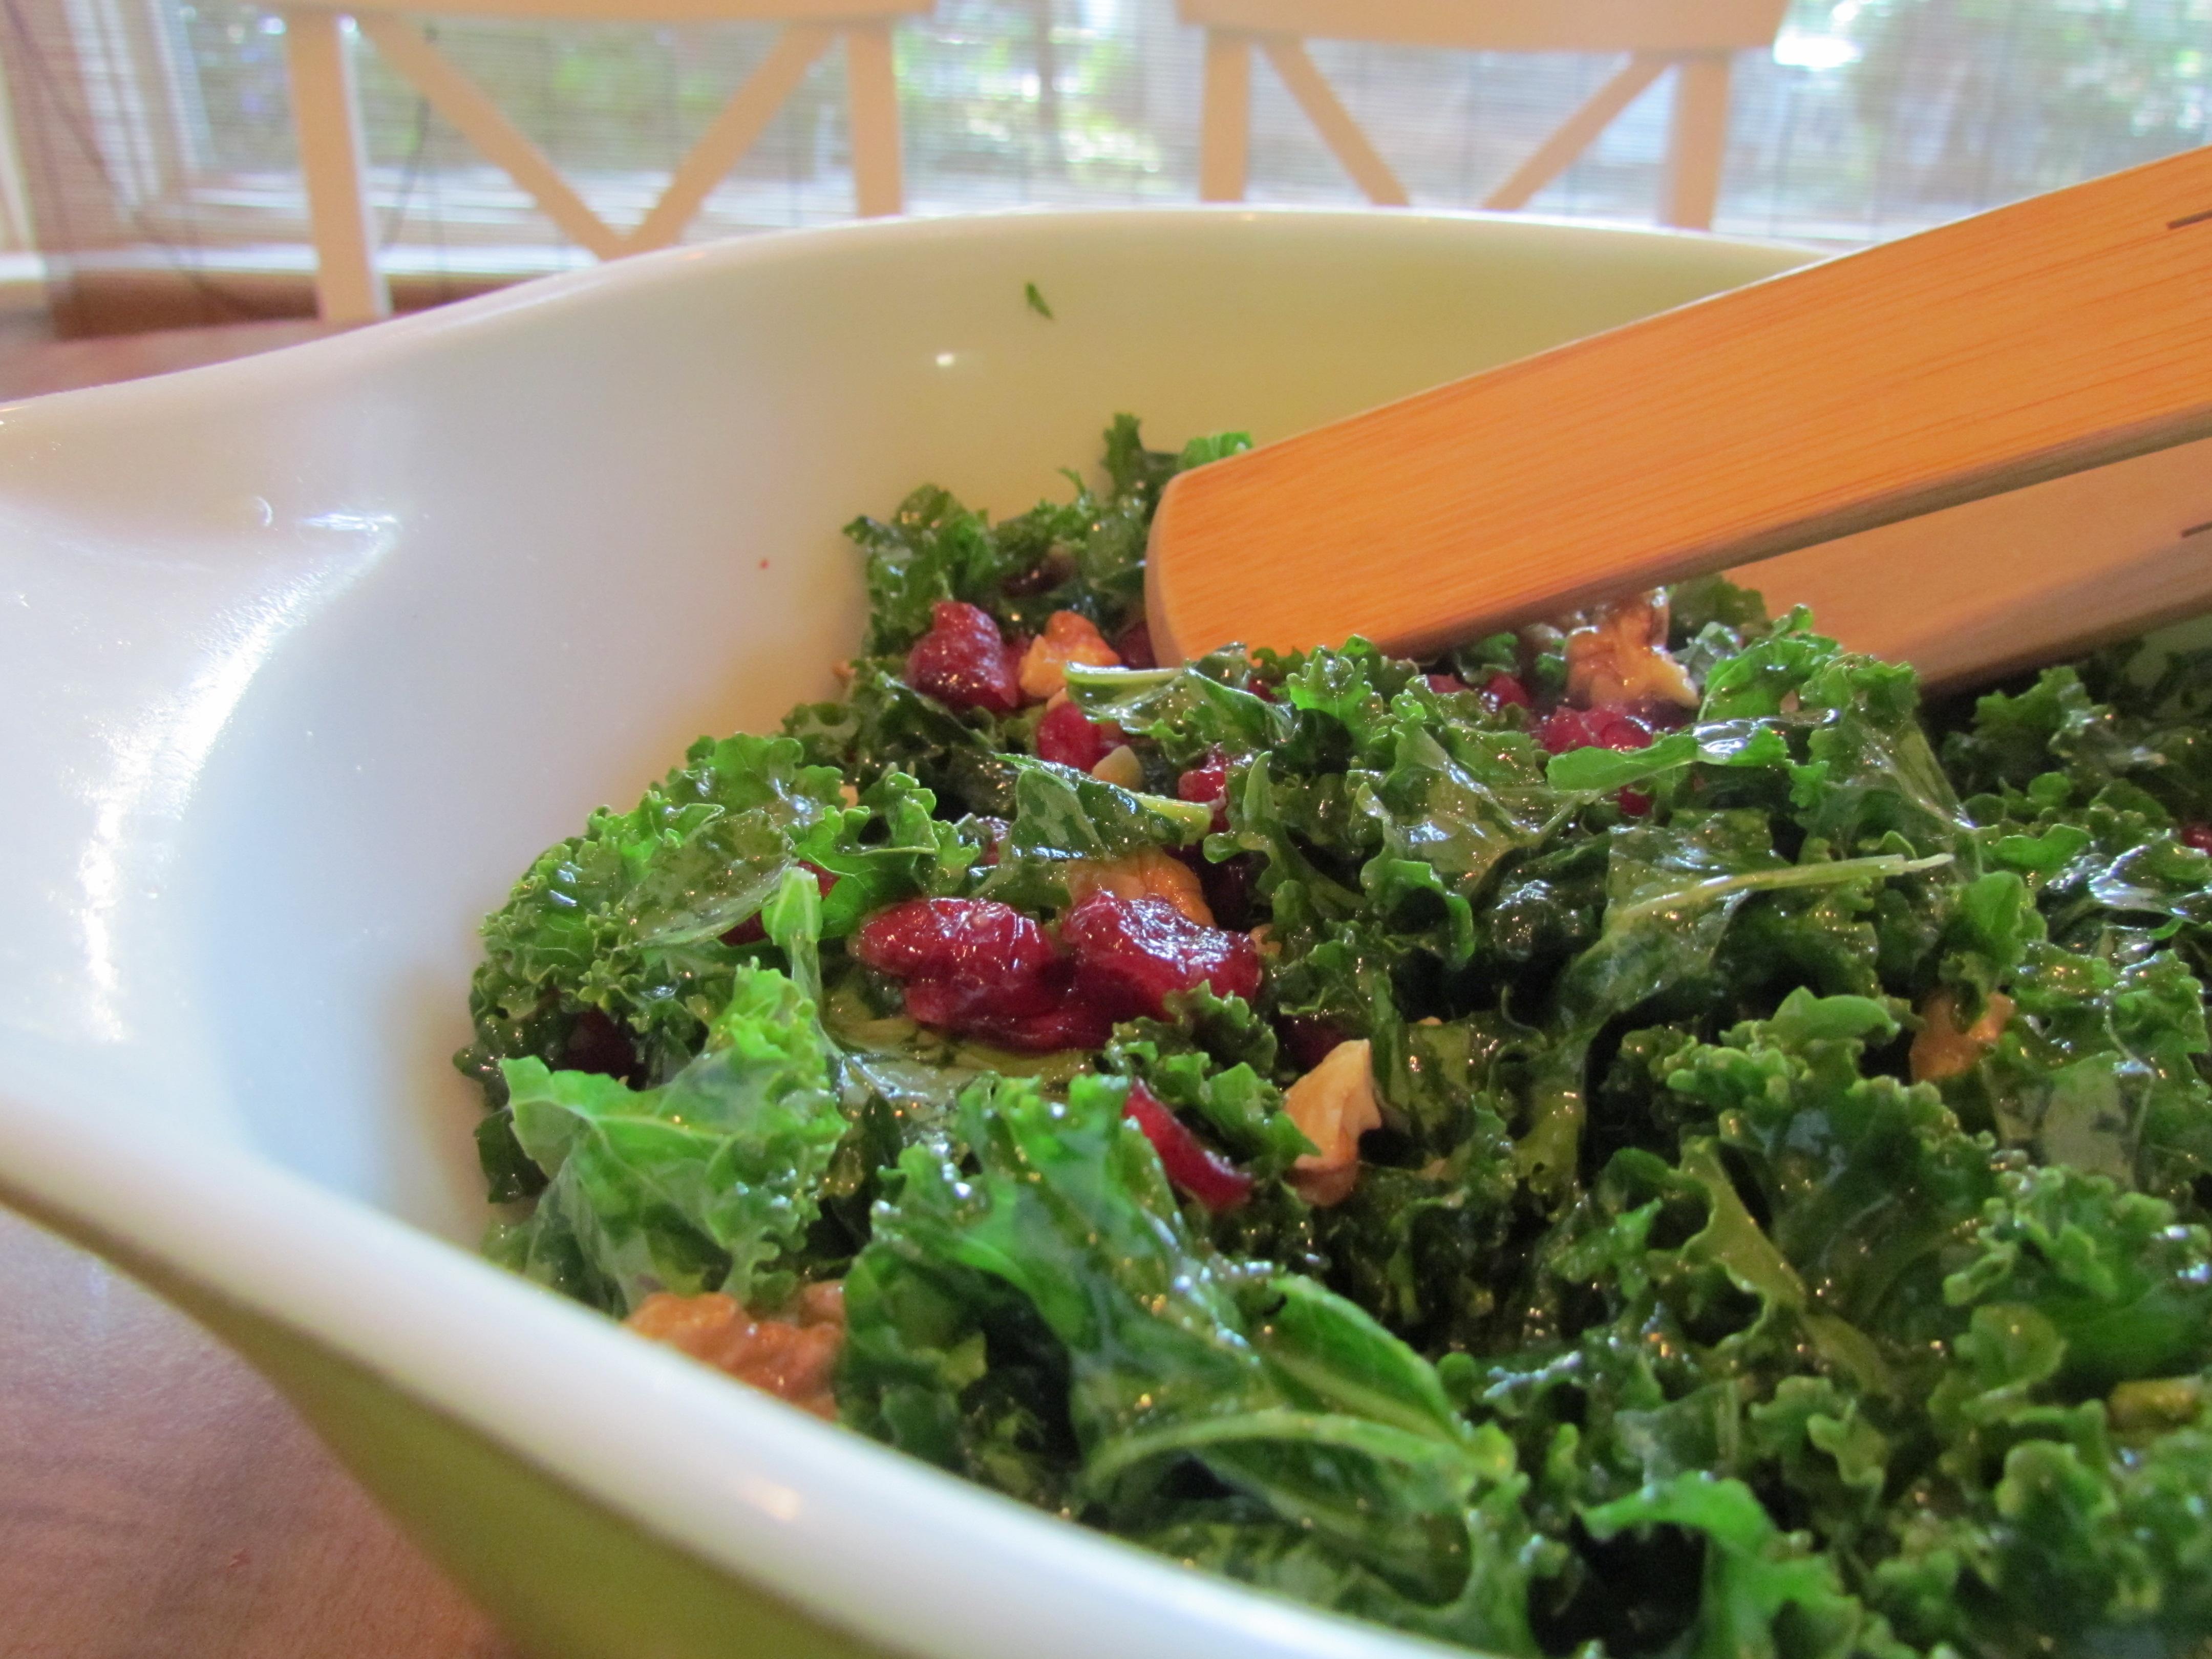 Kale salad whole foods knock off keeprecipes your universal kale salad whole foods knock off keeprecipes your universal recipe box forumfinder Gallery